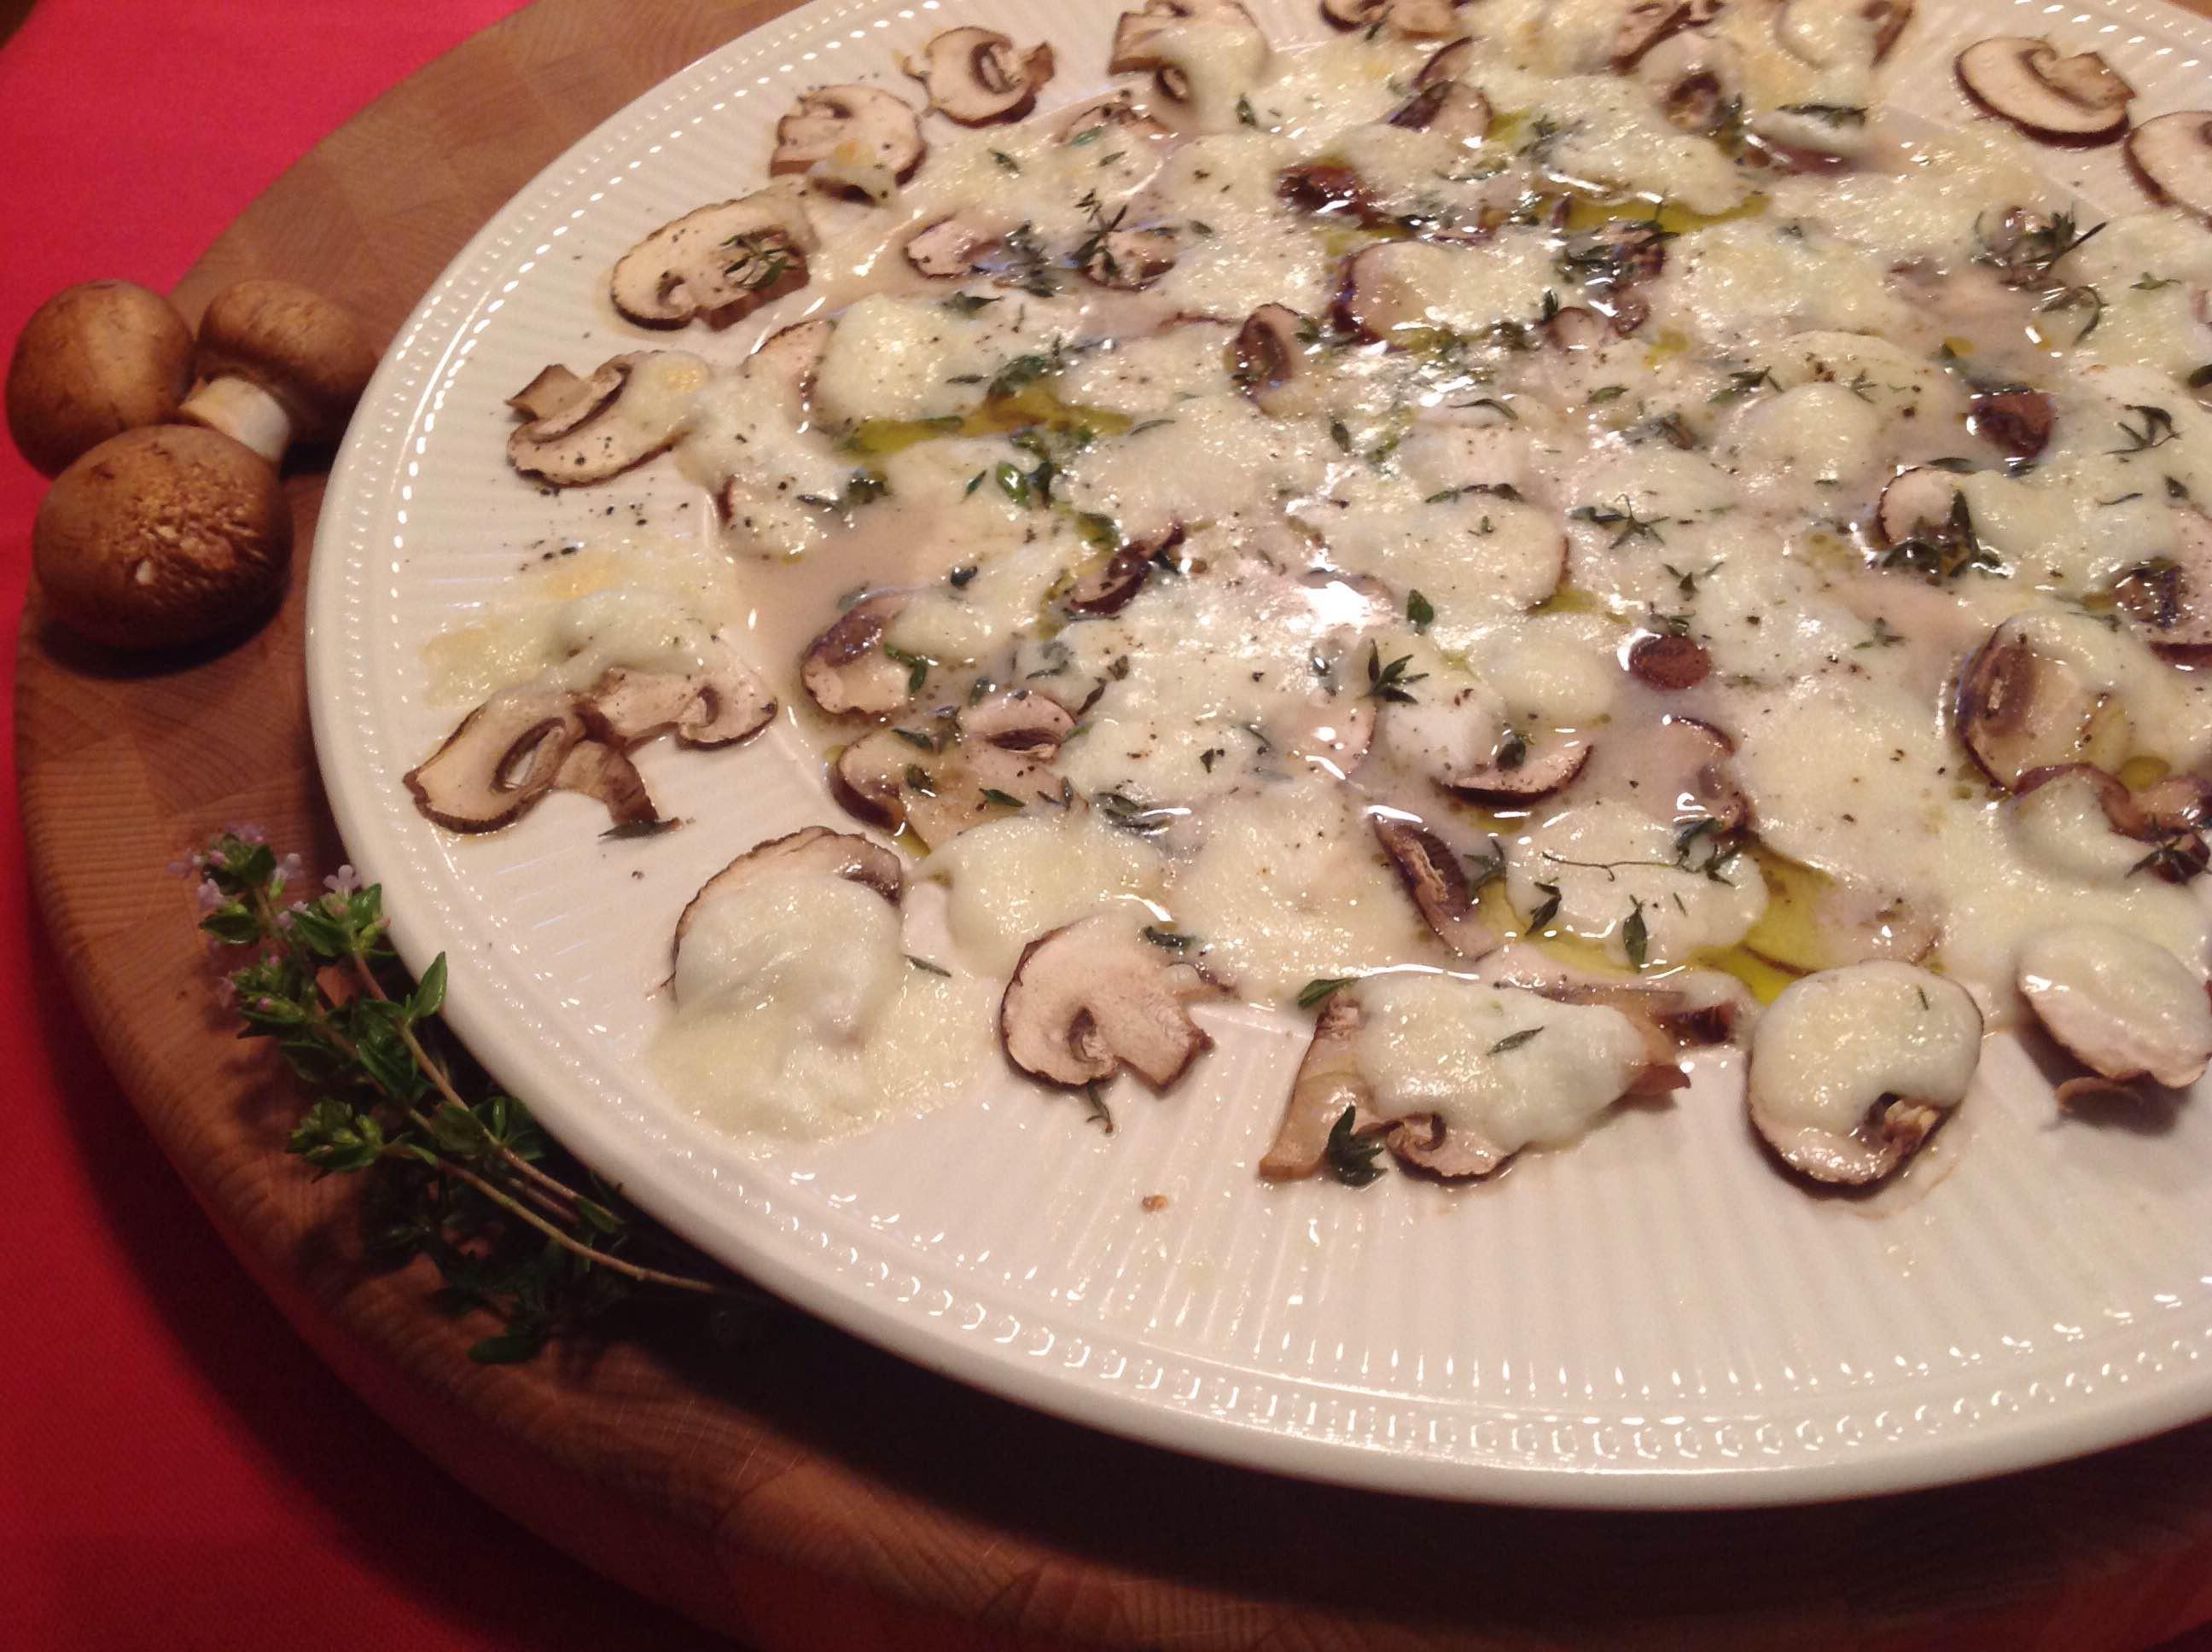 Champignons met gesmolten mozzarella en tijm